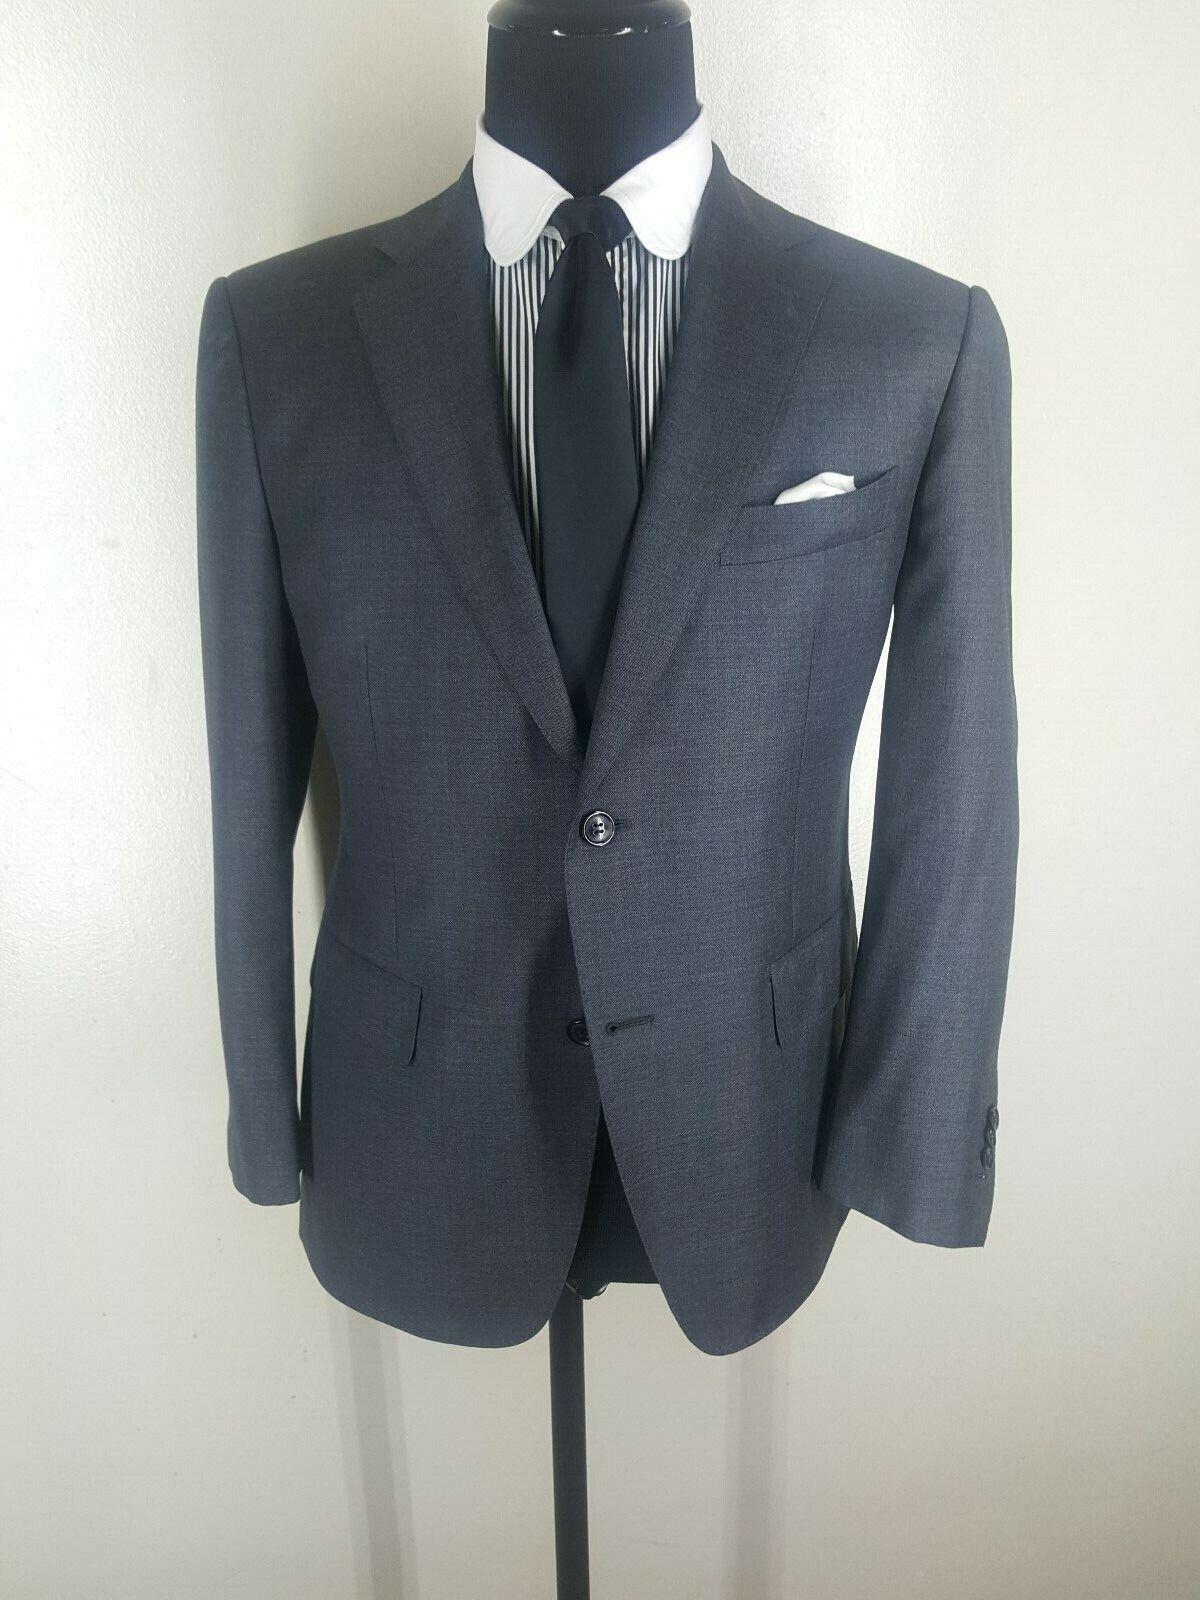 SUIT SUPPLY Super 110'S Wool Sport Coat 2 Btn Side Vents  42 Short